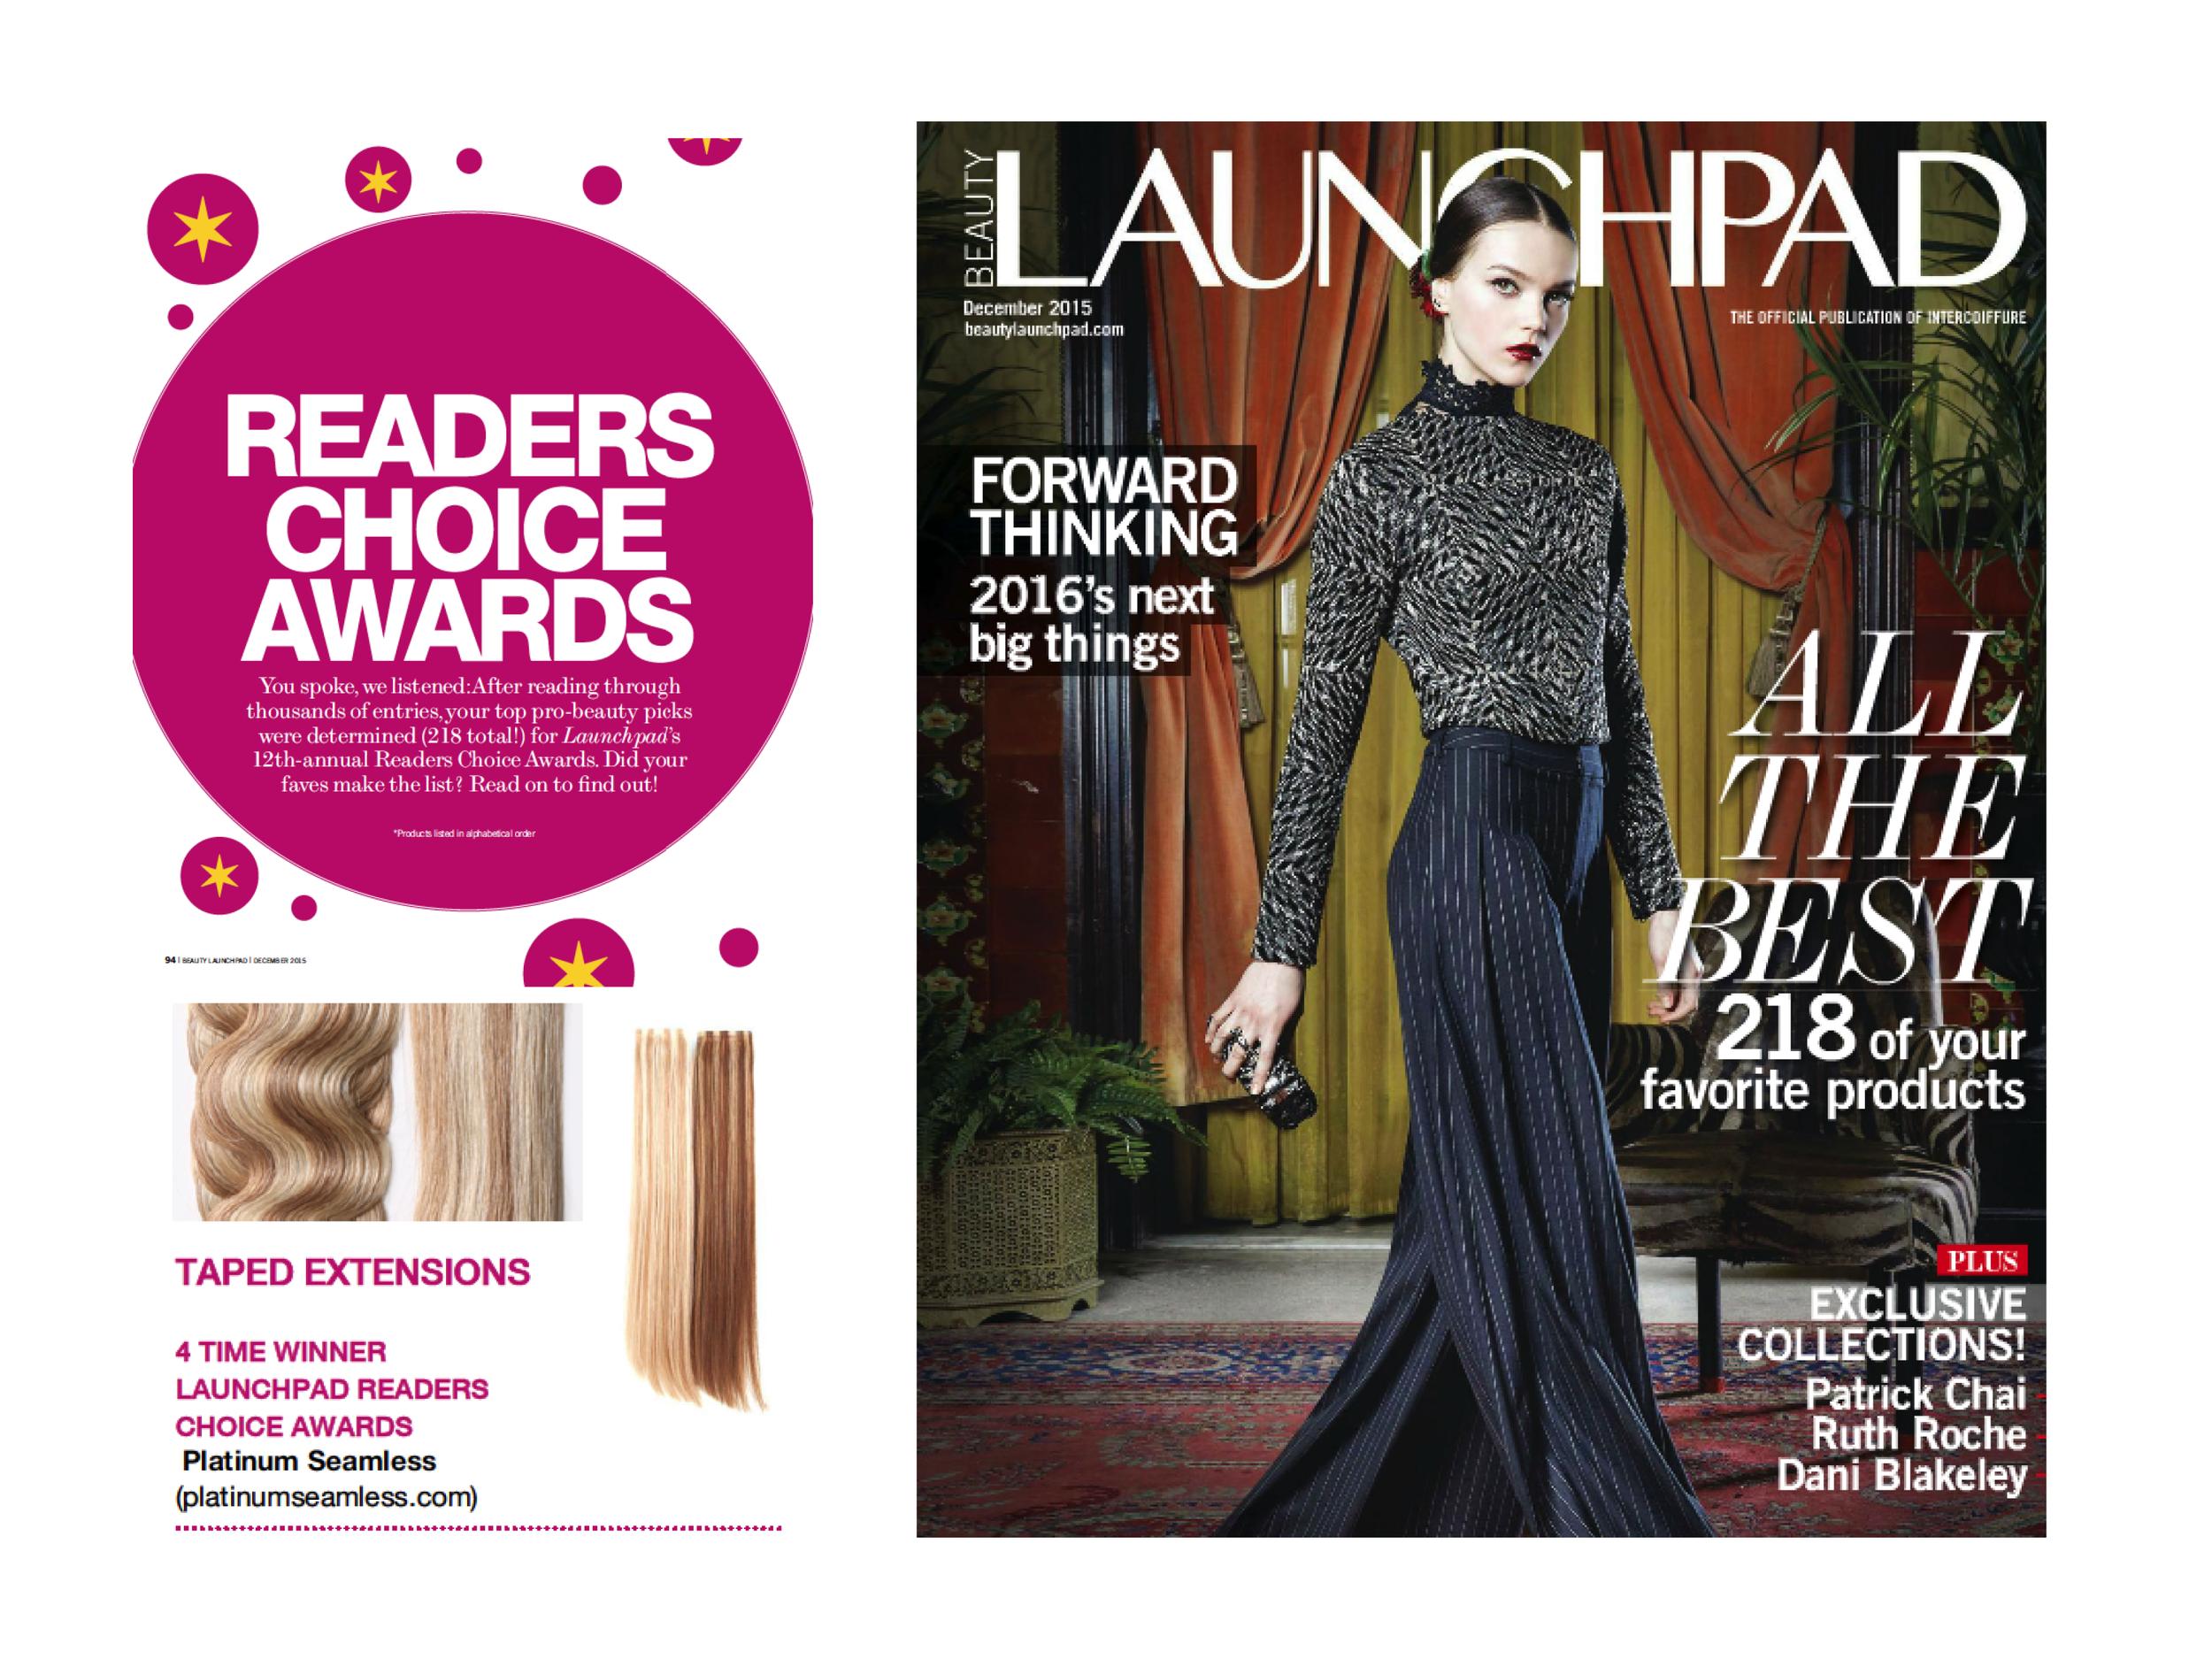 beauty-launchpad-readers-chioce-award